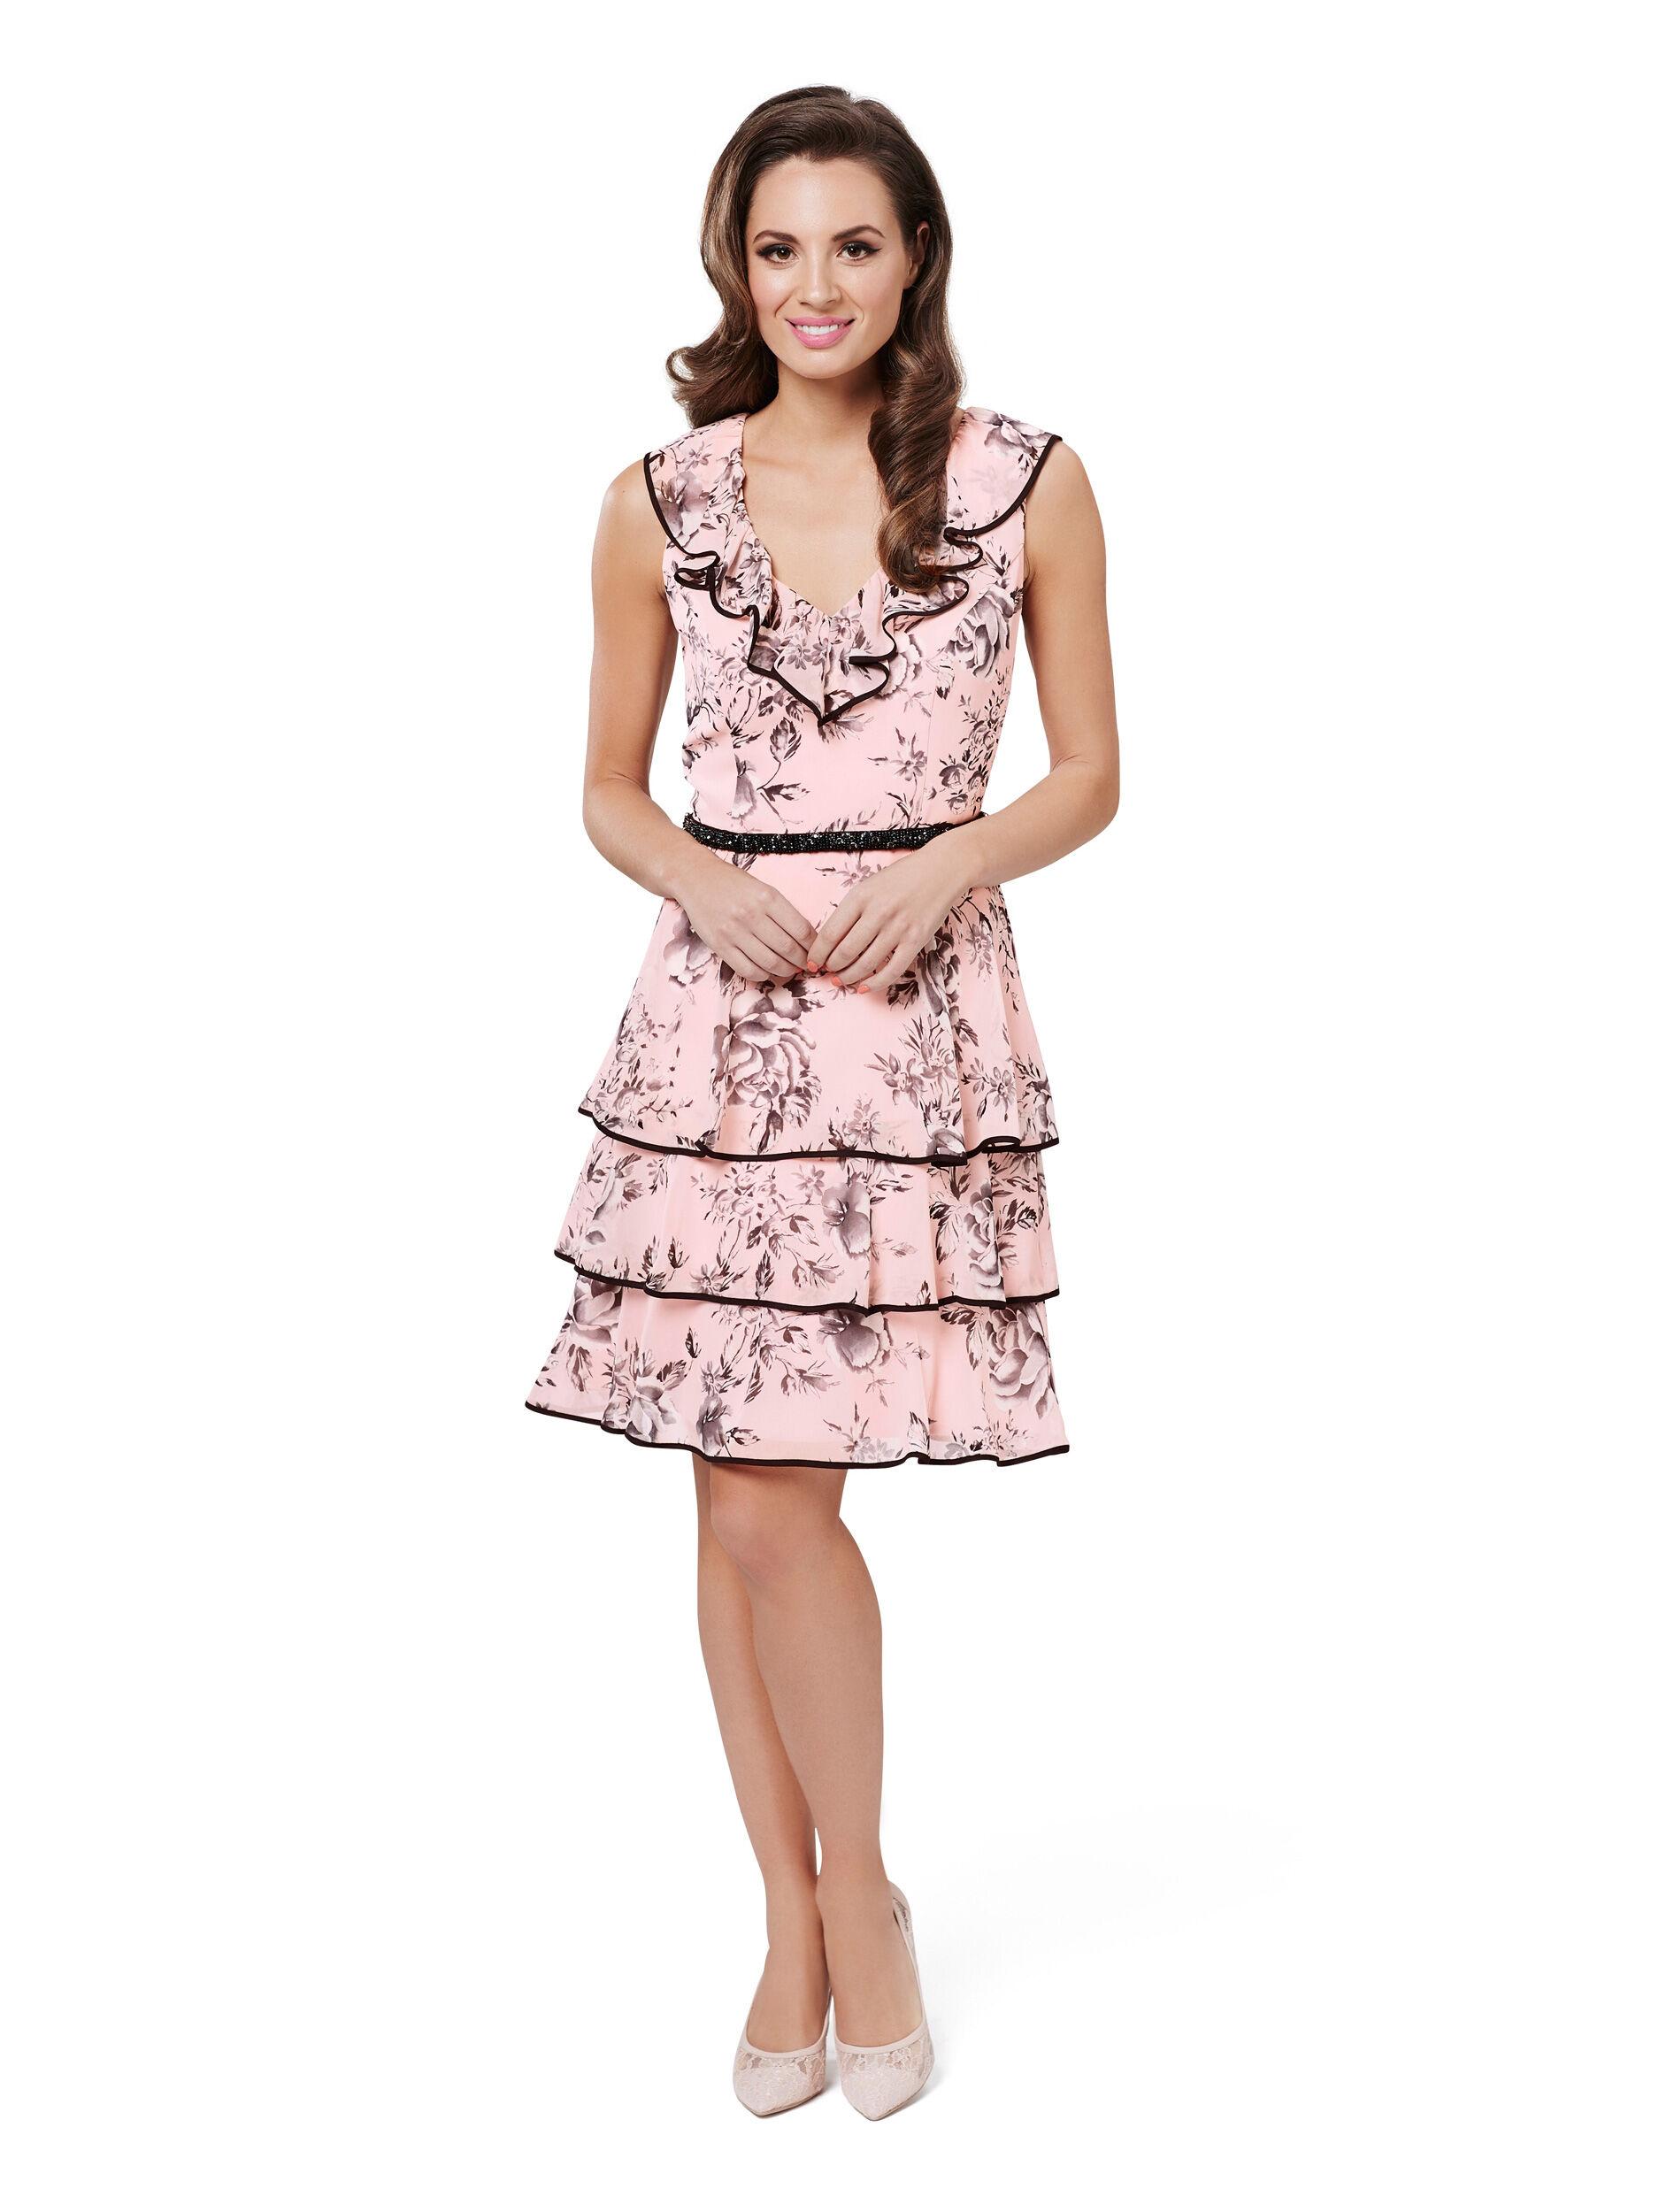 Online Dress Shop Dresses From End West The Review Australia qZXUfx